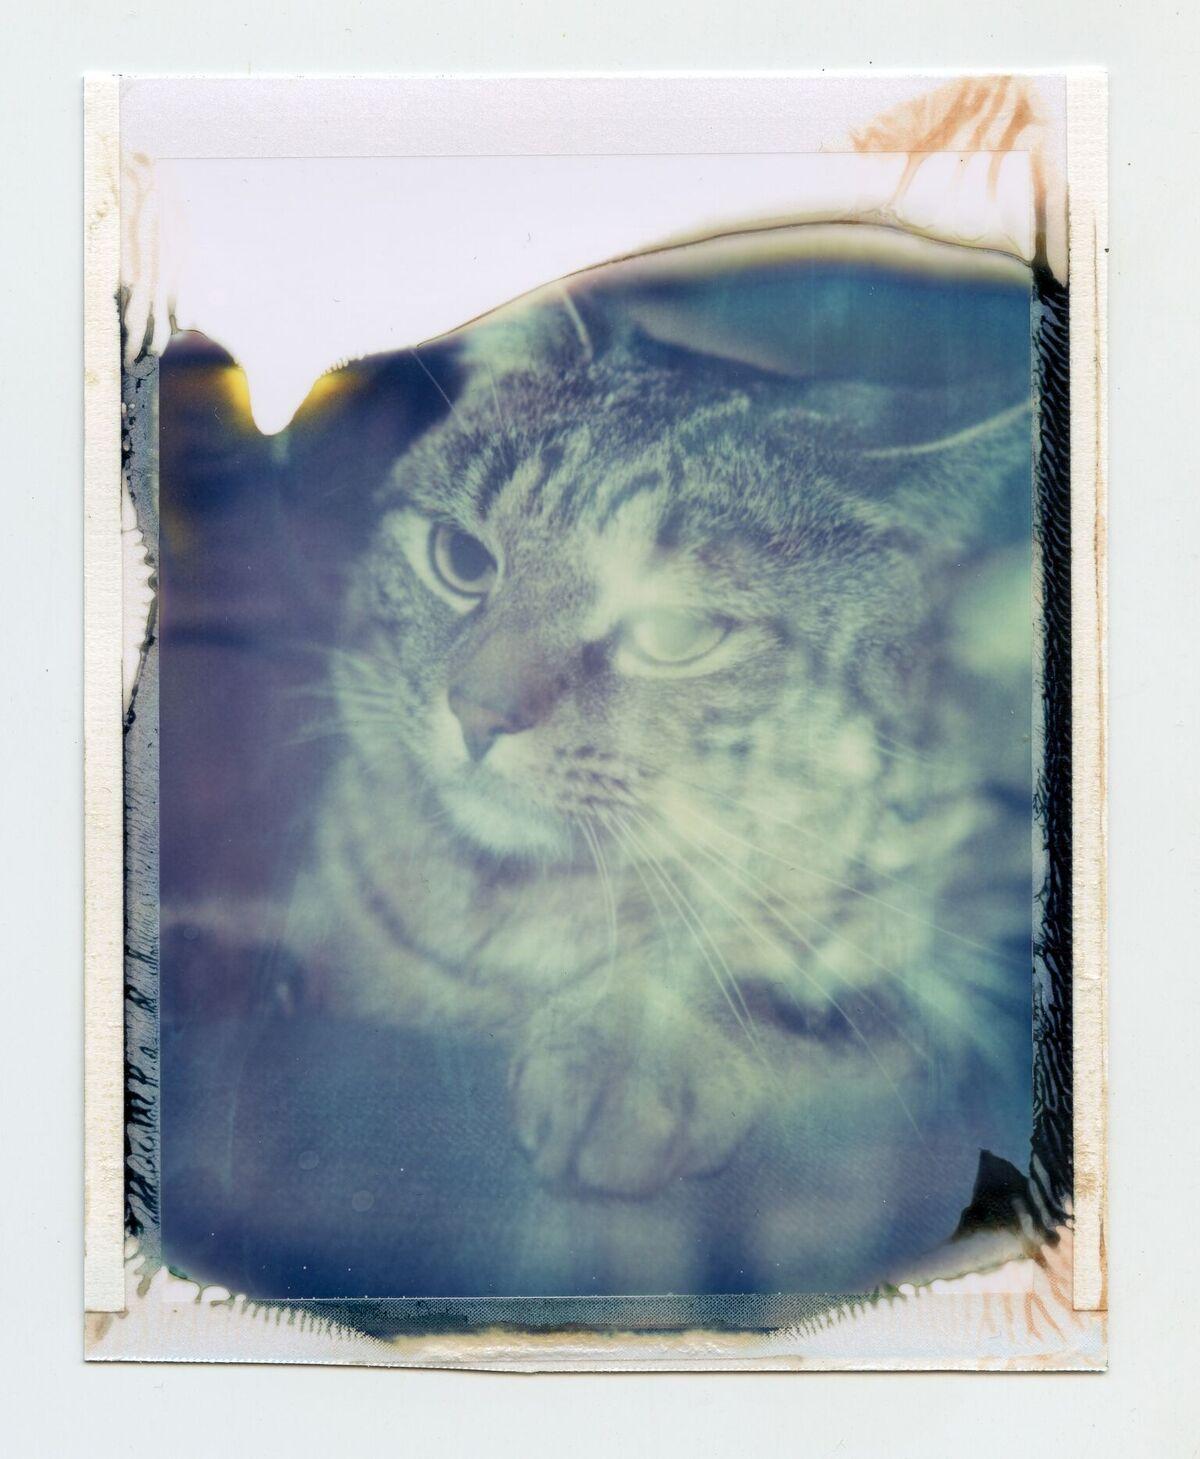 Andrew the Cat | Polaroid 180 | Polaroid 669 film | Blair Daffy